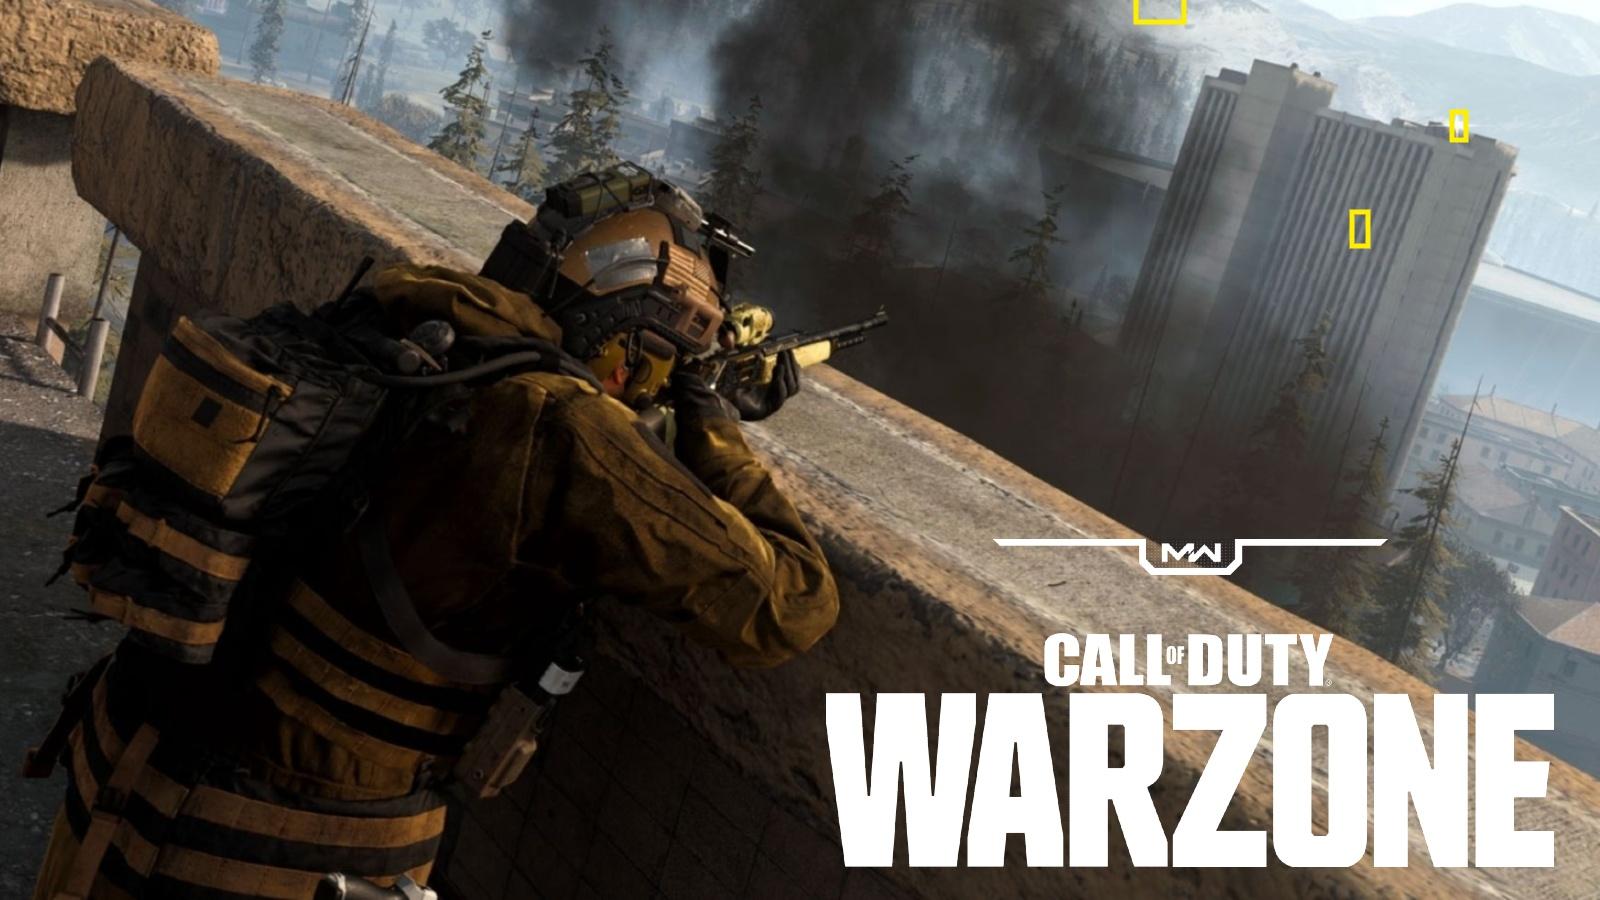 Warzone hacks yellow boxes